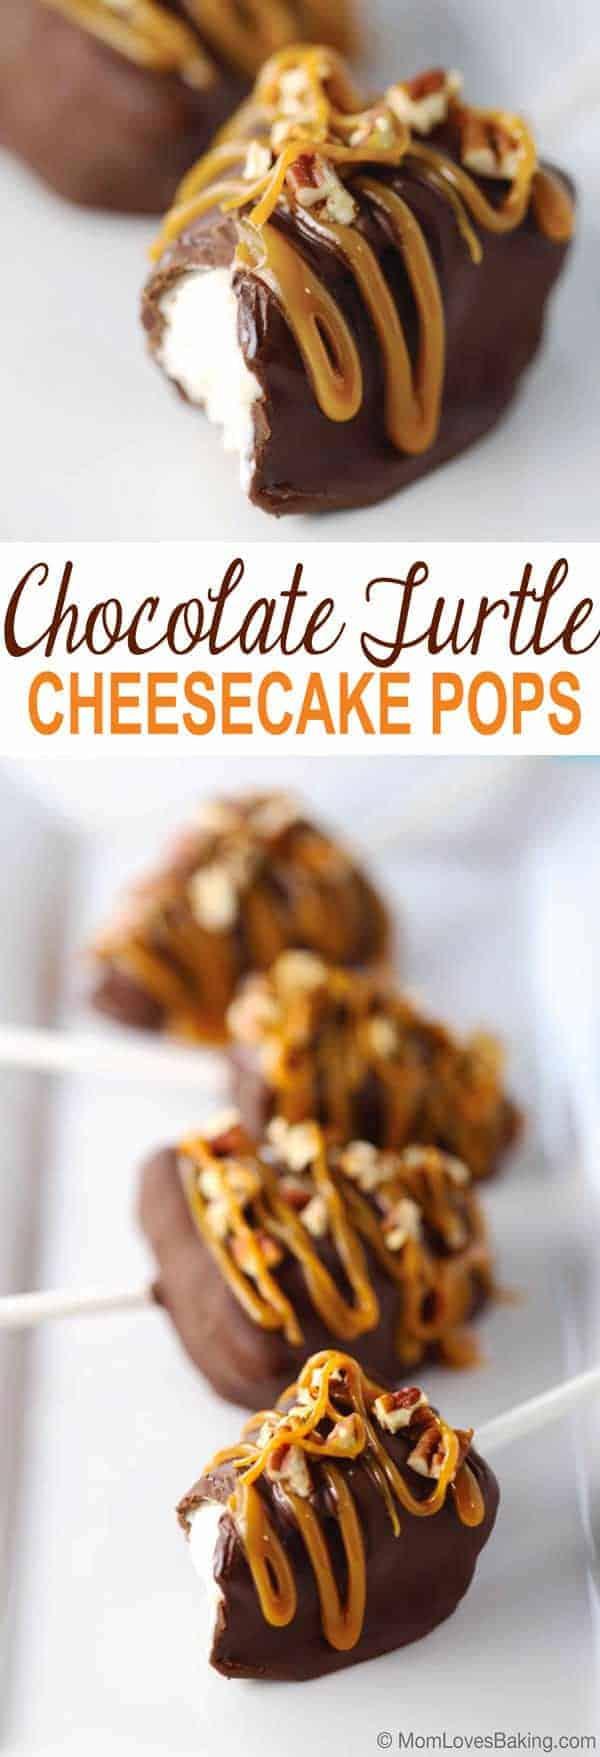 Chocolate Turtle Cheesecake Pops